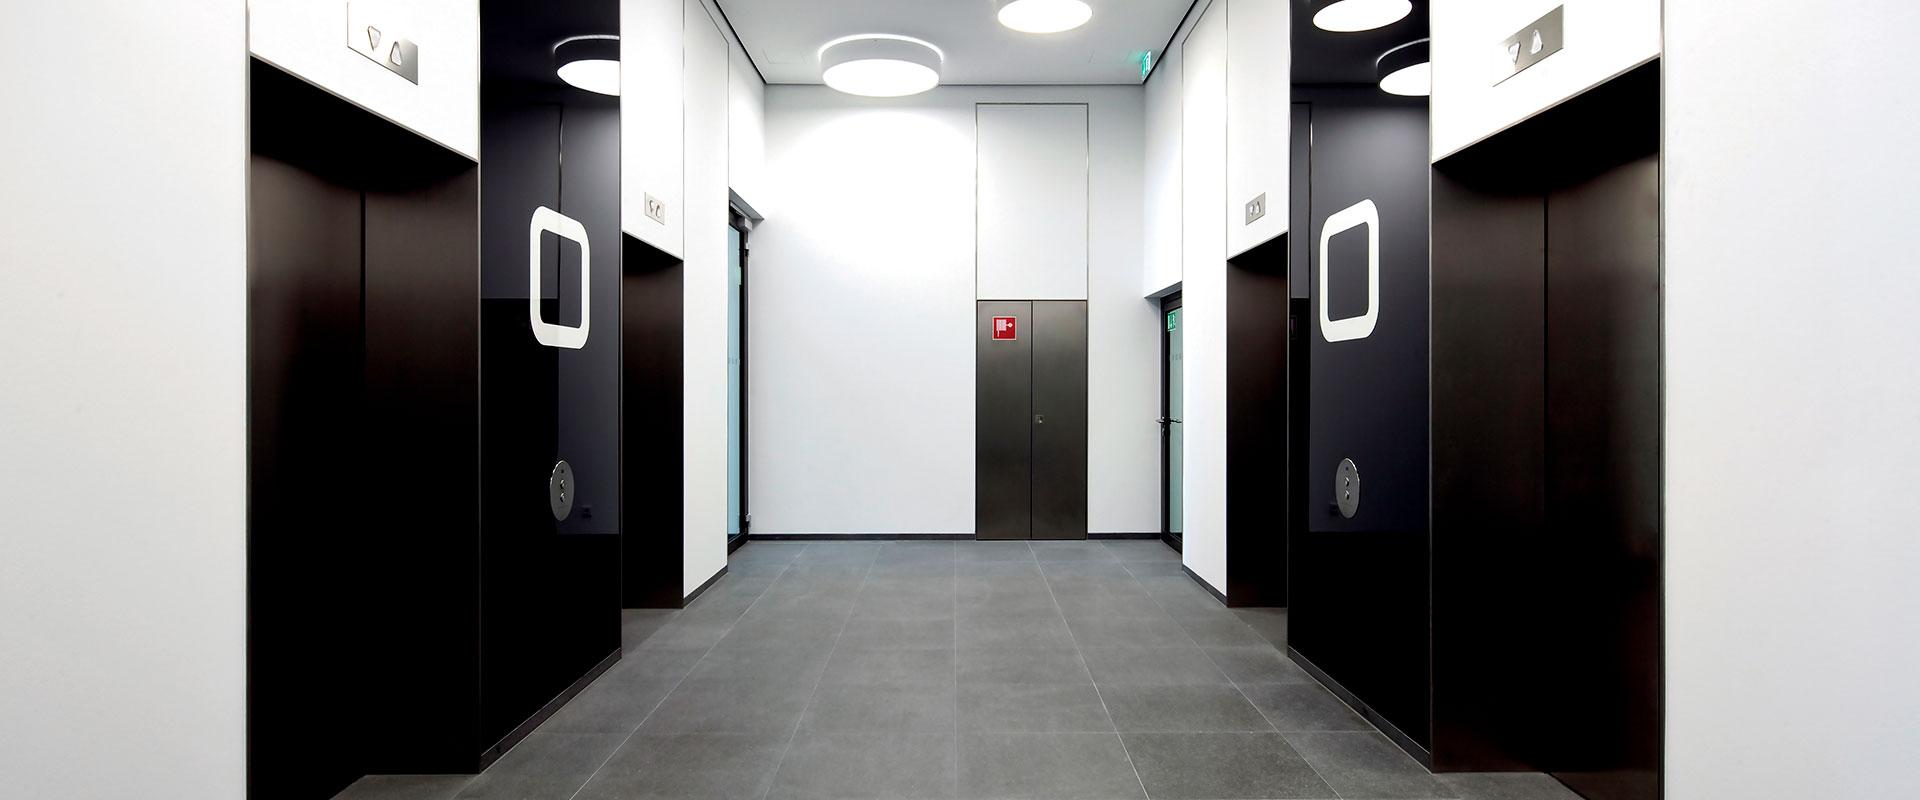 AGGLOTECH-progetto-benningsenplatz-slider-3